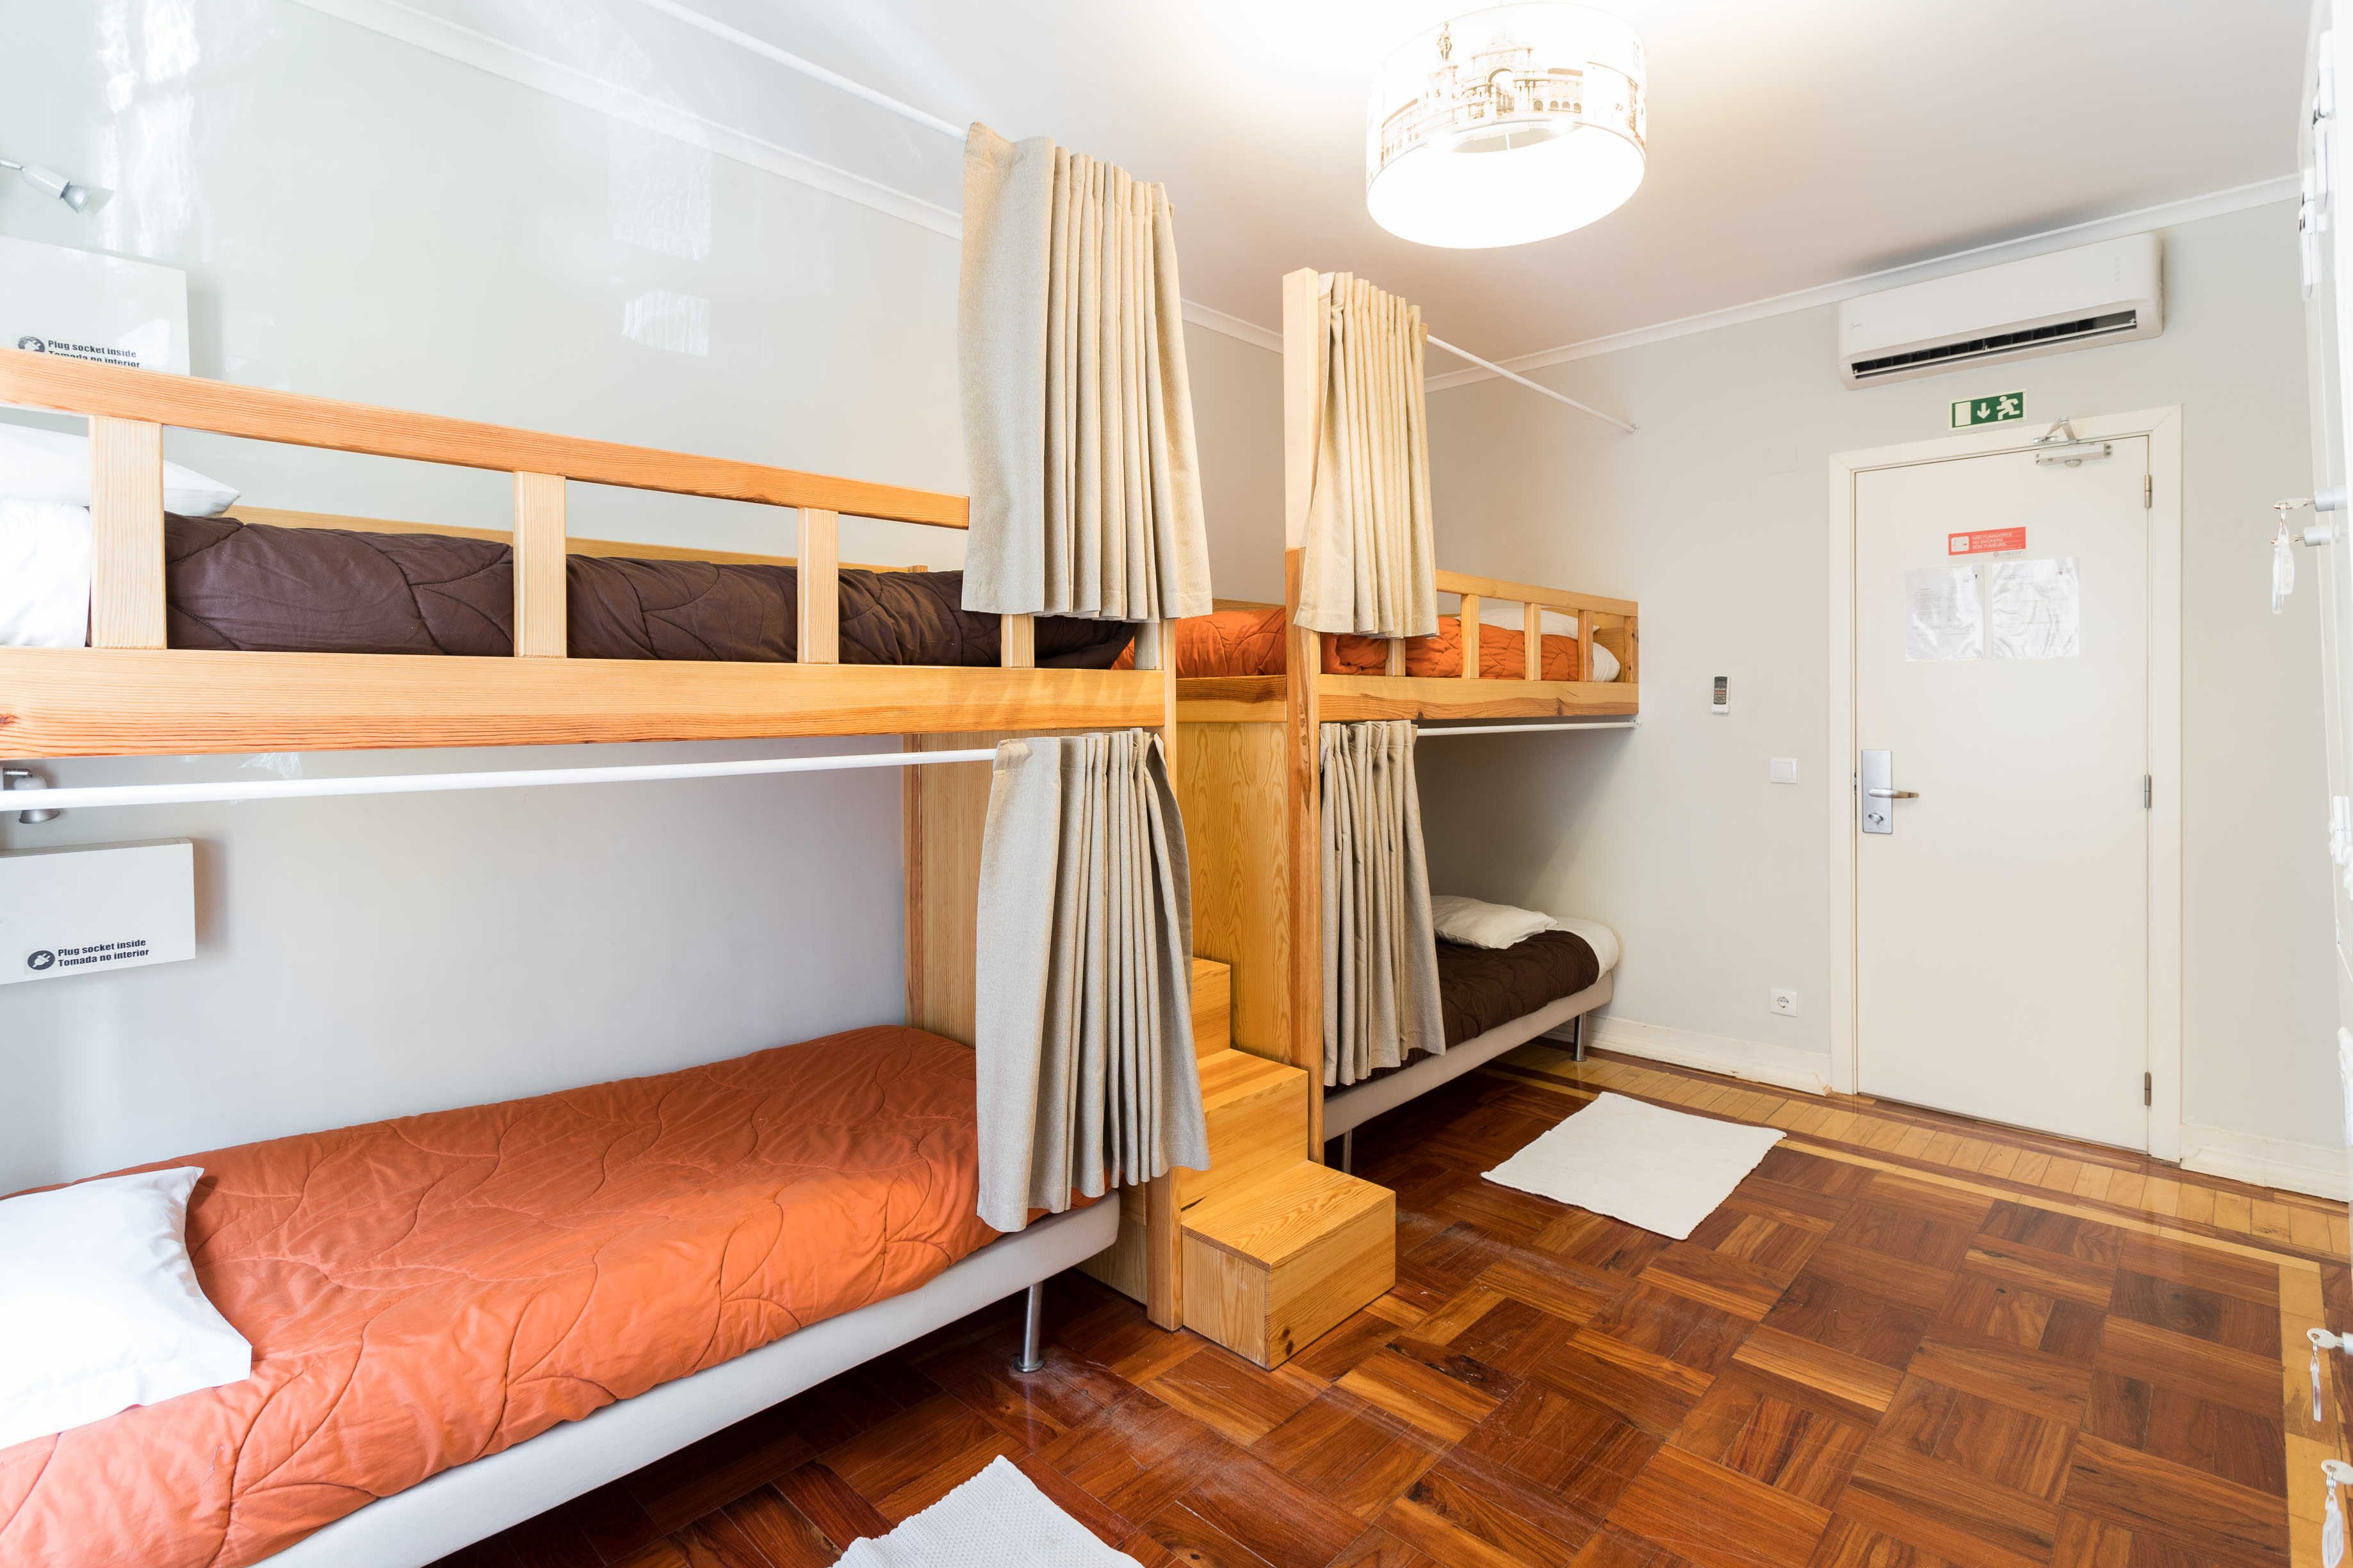 Lisboa Central Hostel